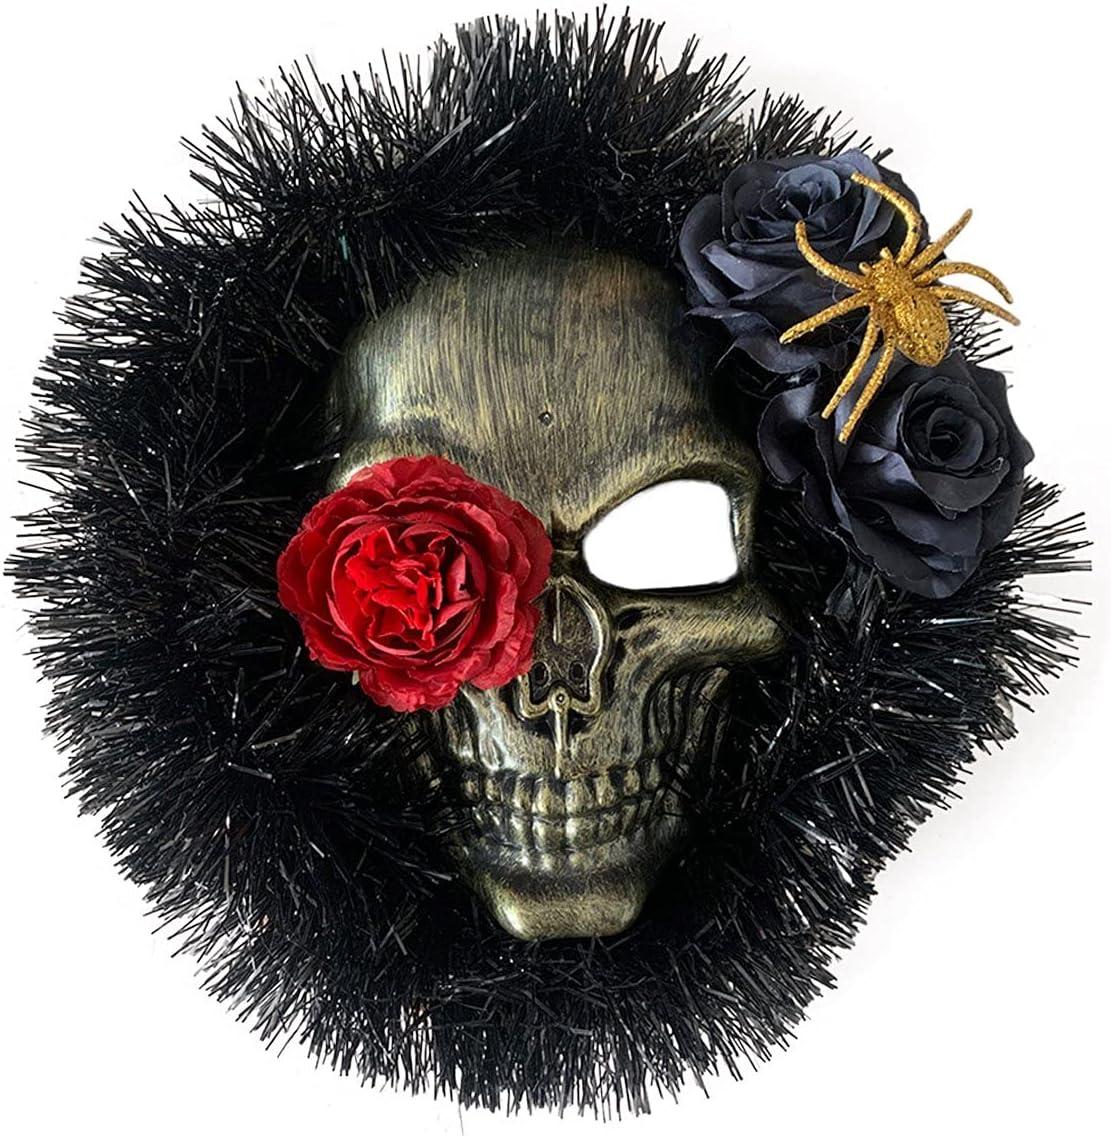 Laurel Halloween Decoration Spider Skull D Pendant Wreath Trust OFFicial store Window